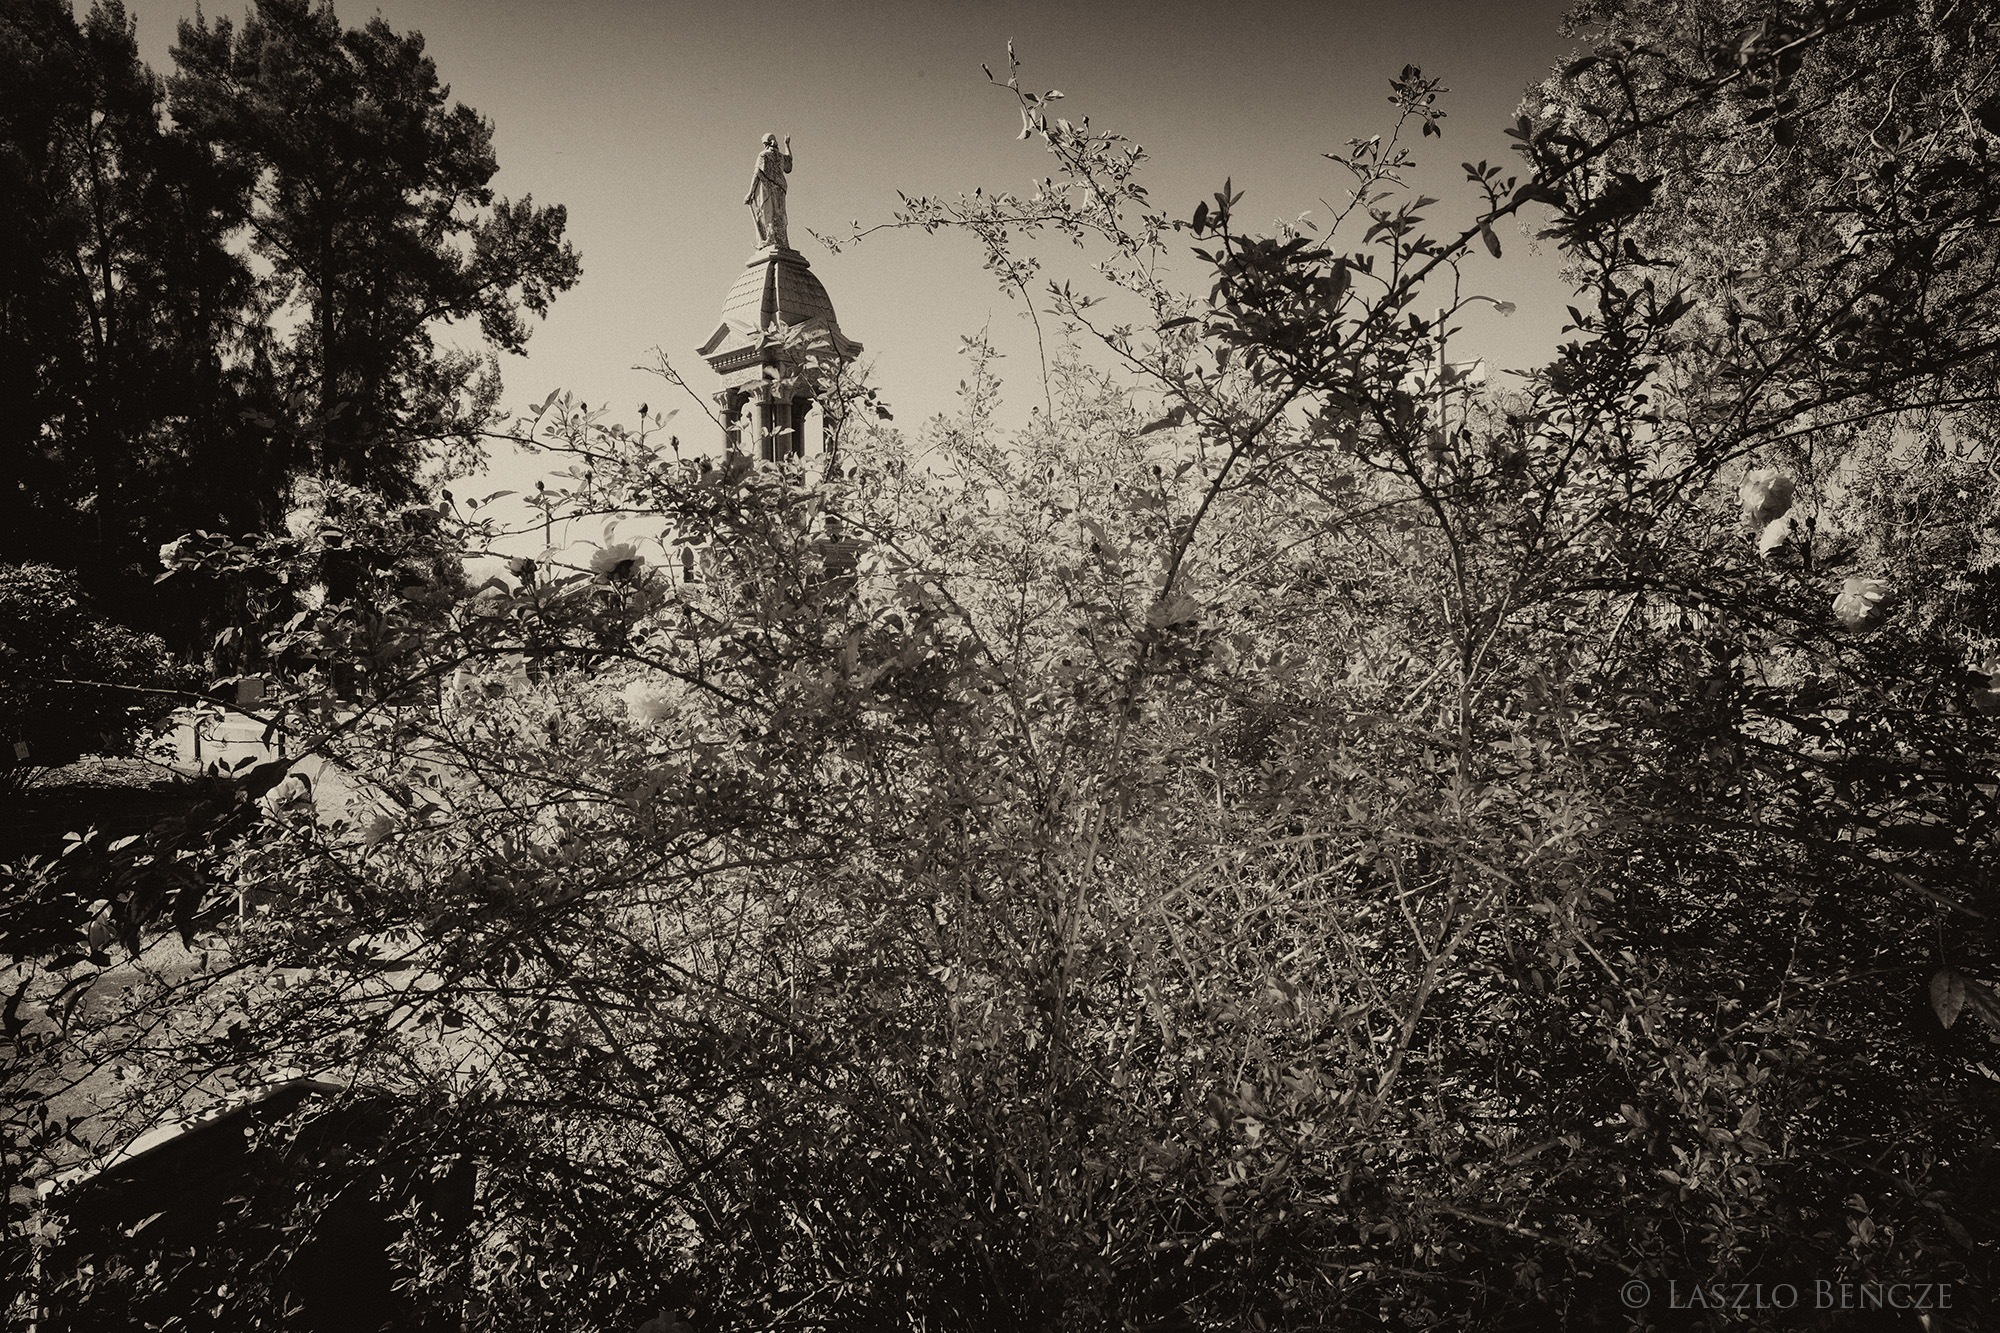 Cemetery #22, Cupola by Laszlo Bencze